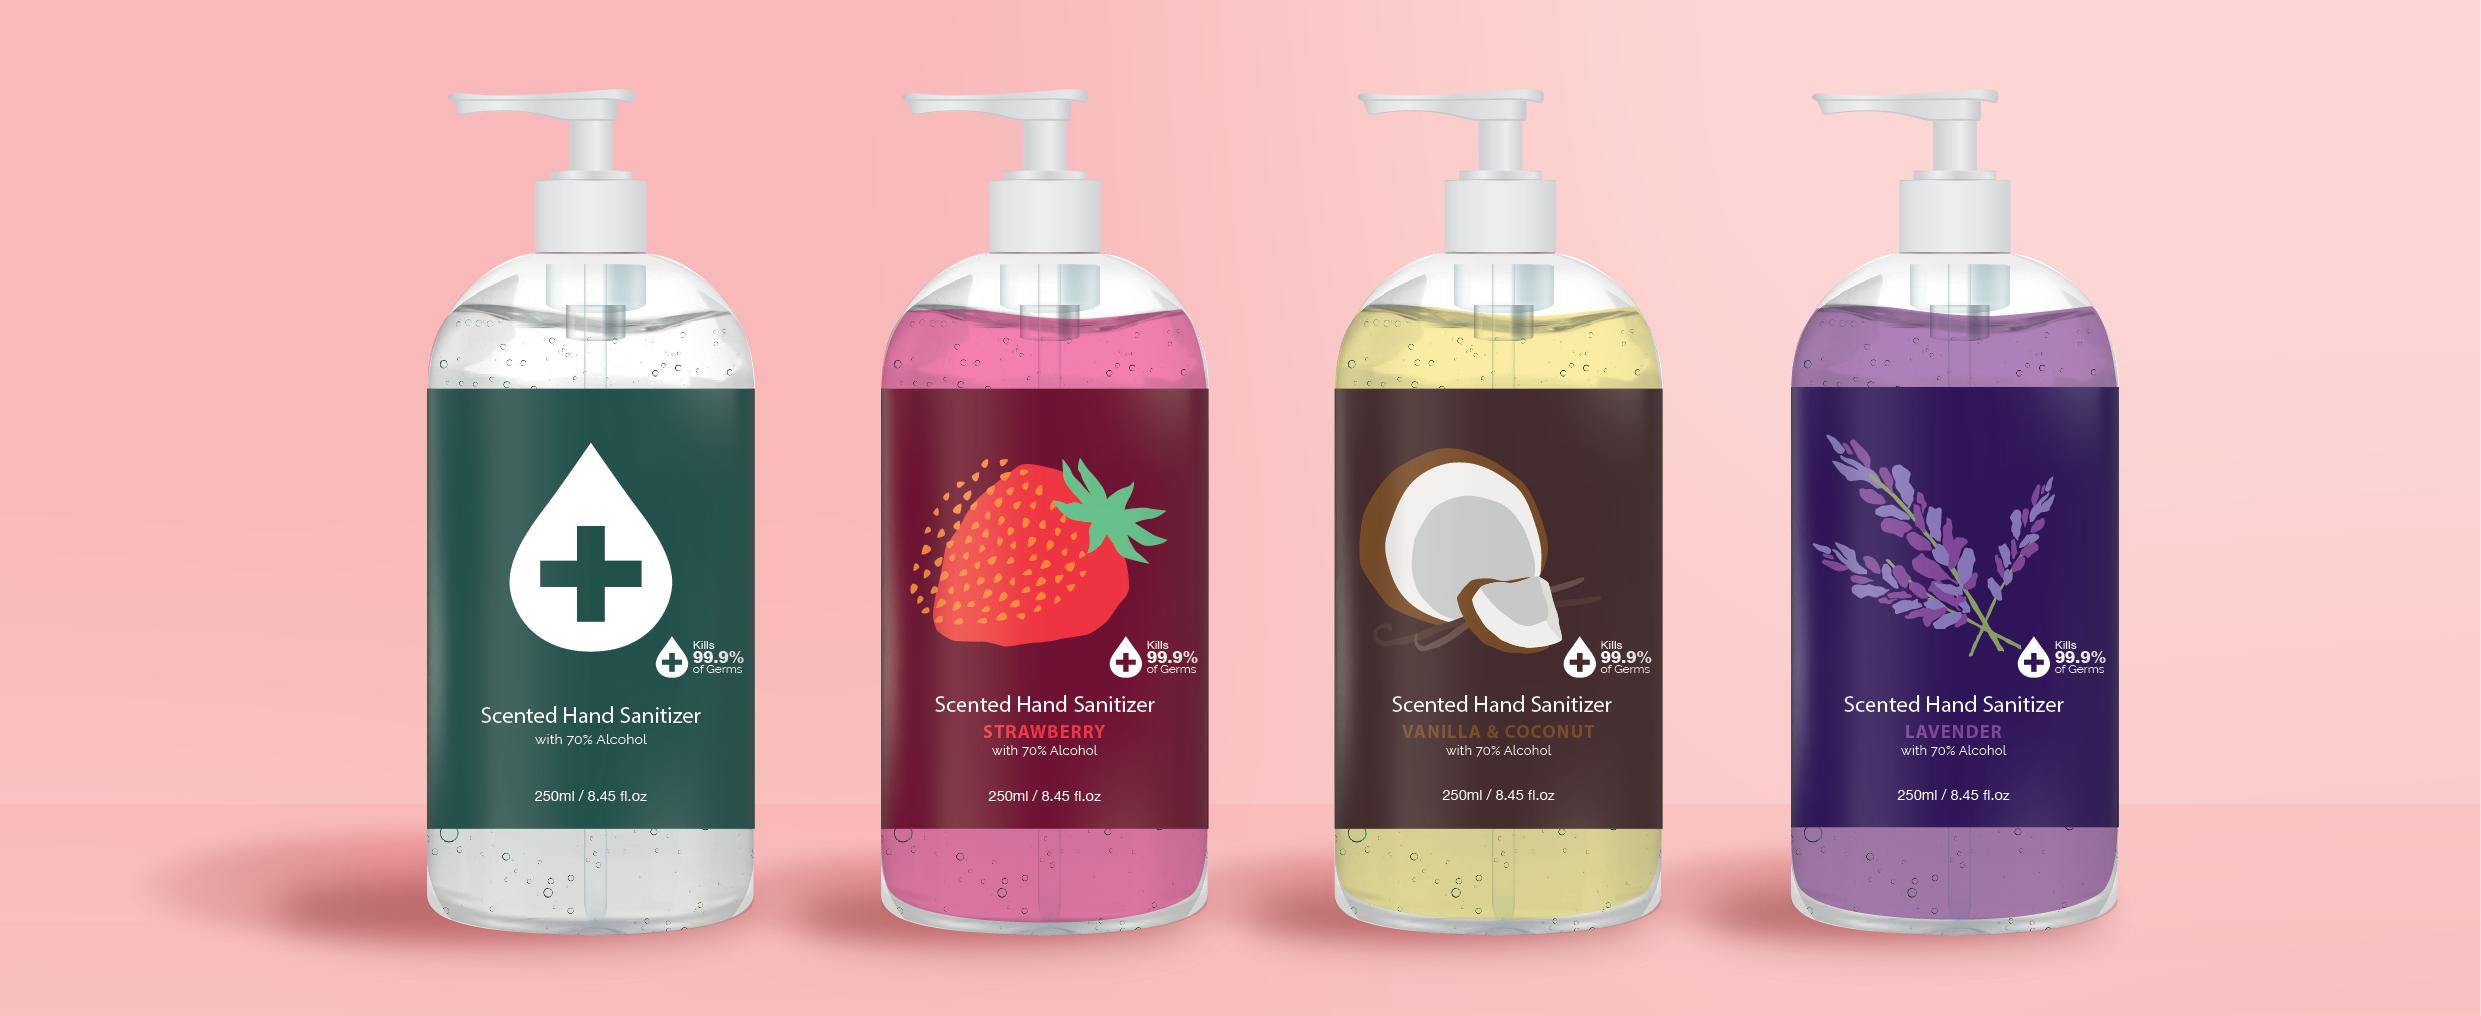 Hand Sanitizer Illustration 002 1 - OEM ODM Cosmetic Manufacture